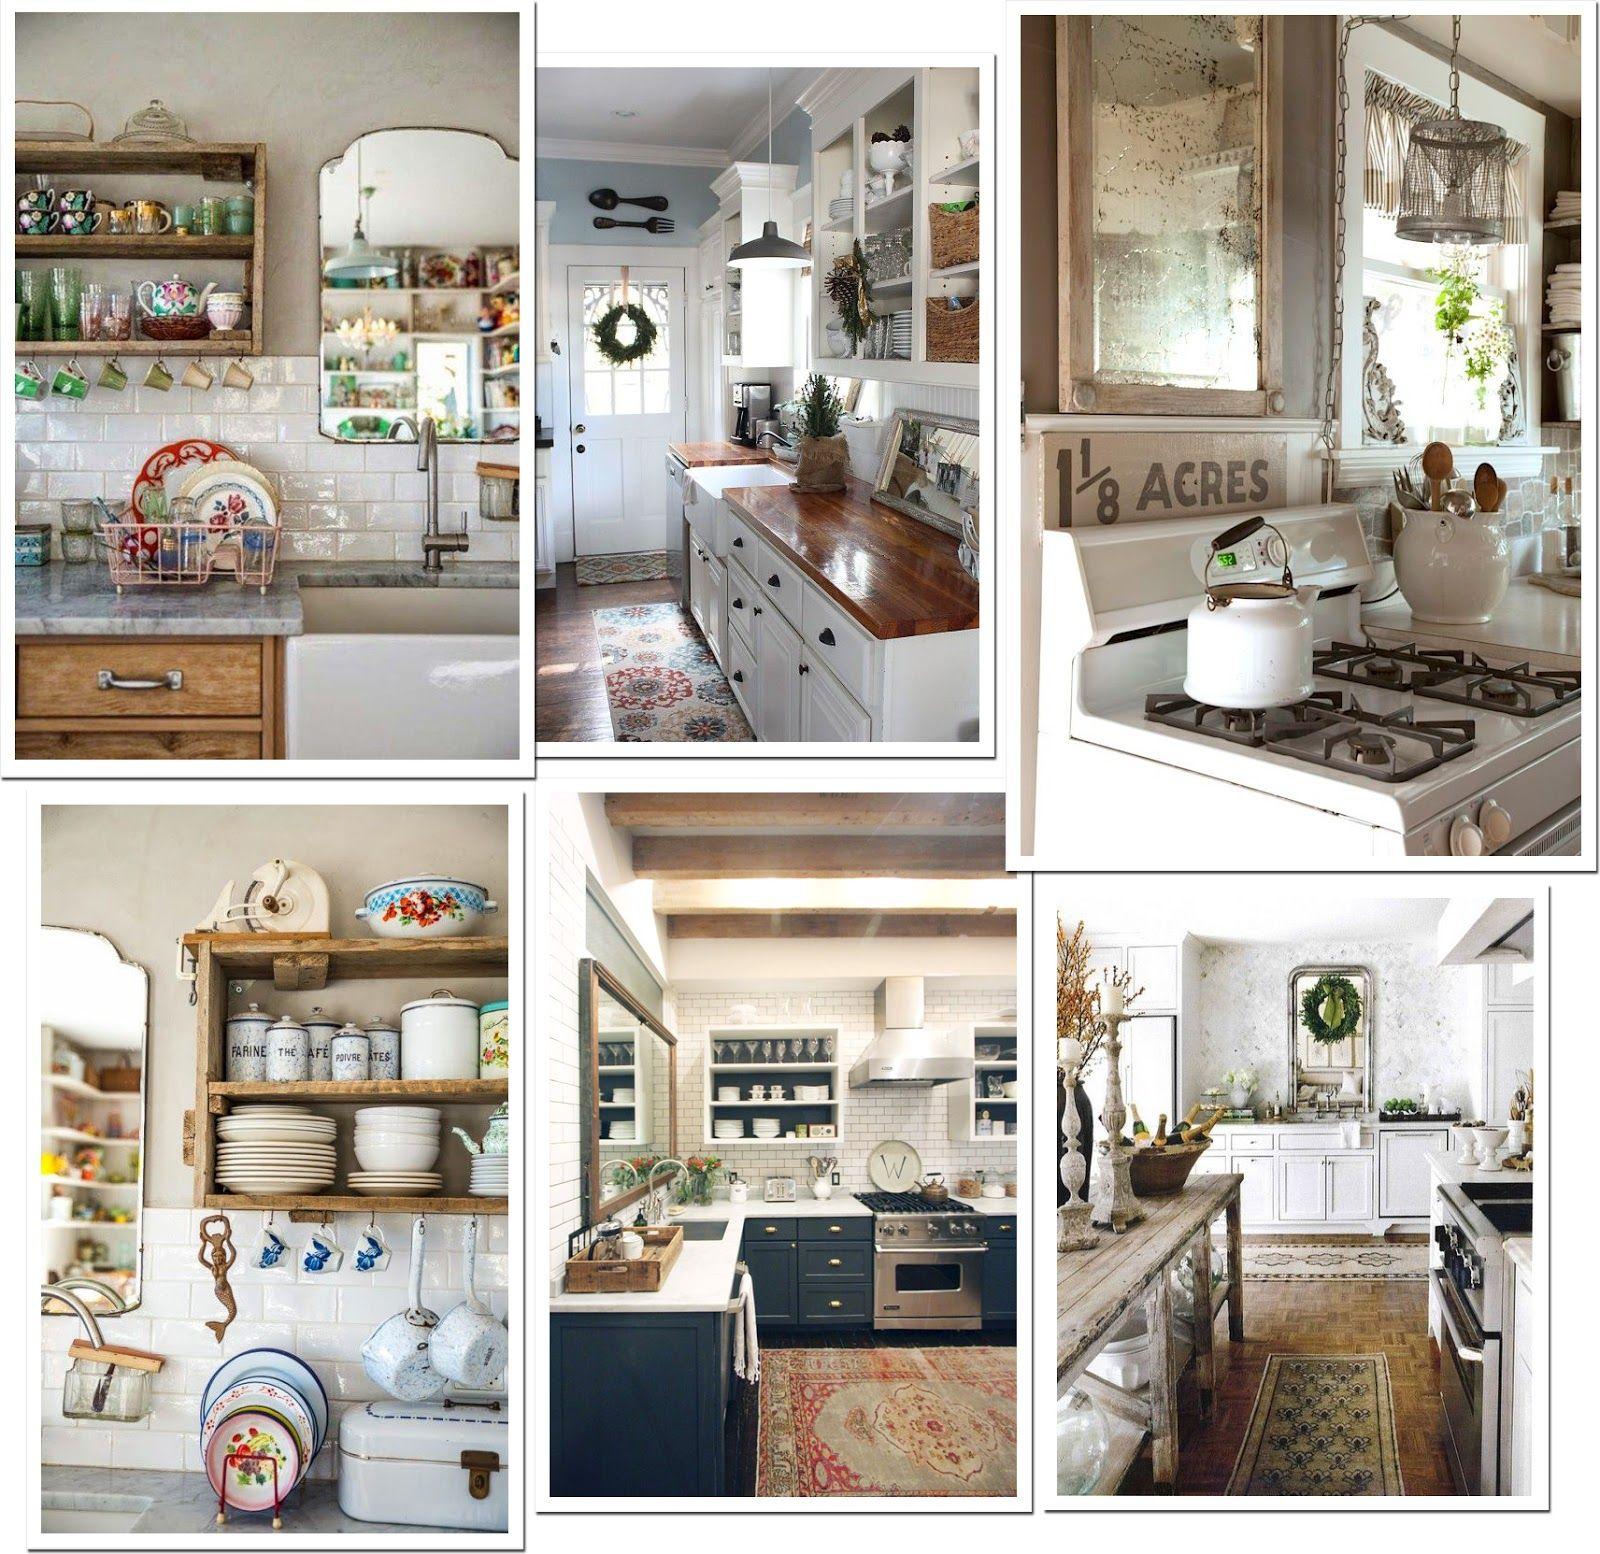 Uno specchio in cucina - Shabby Chic Interiors | cucine ...